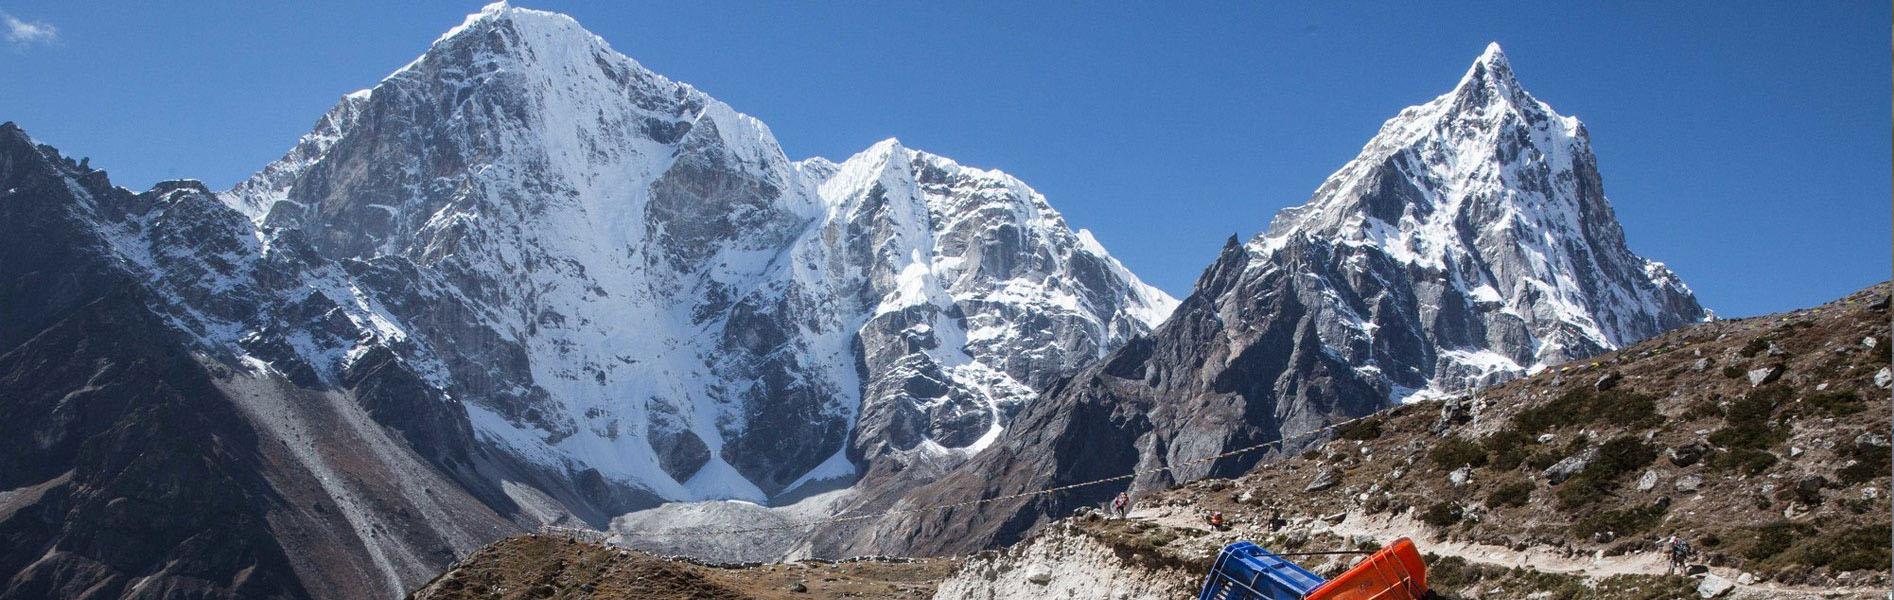 Ethic Himalaya Treks - Nepal Trekking Company